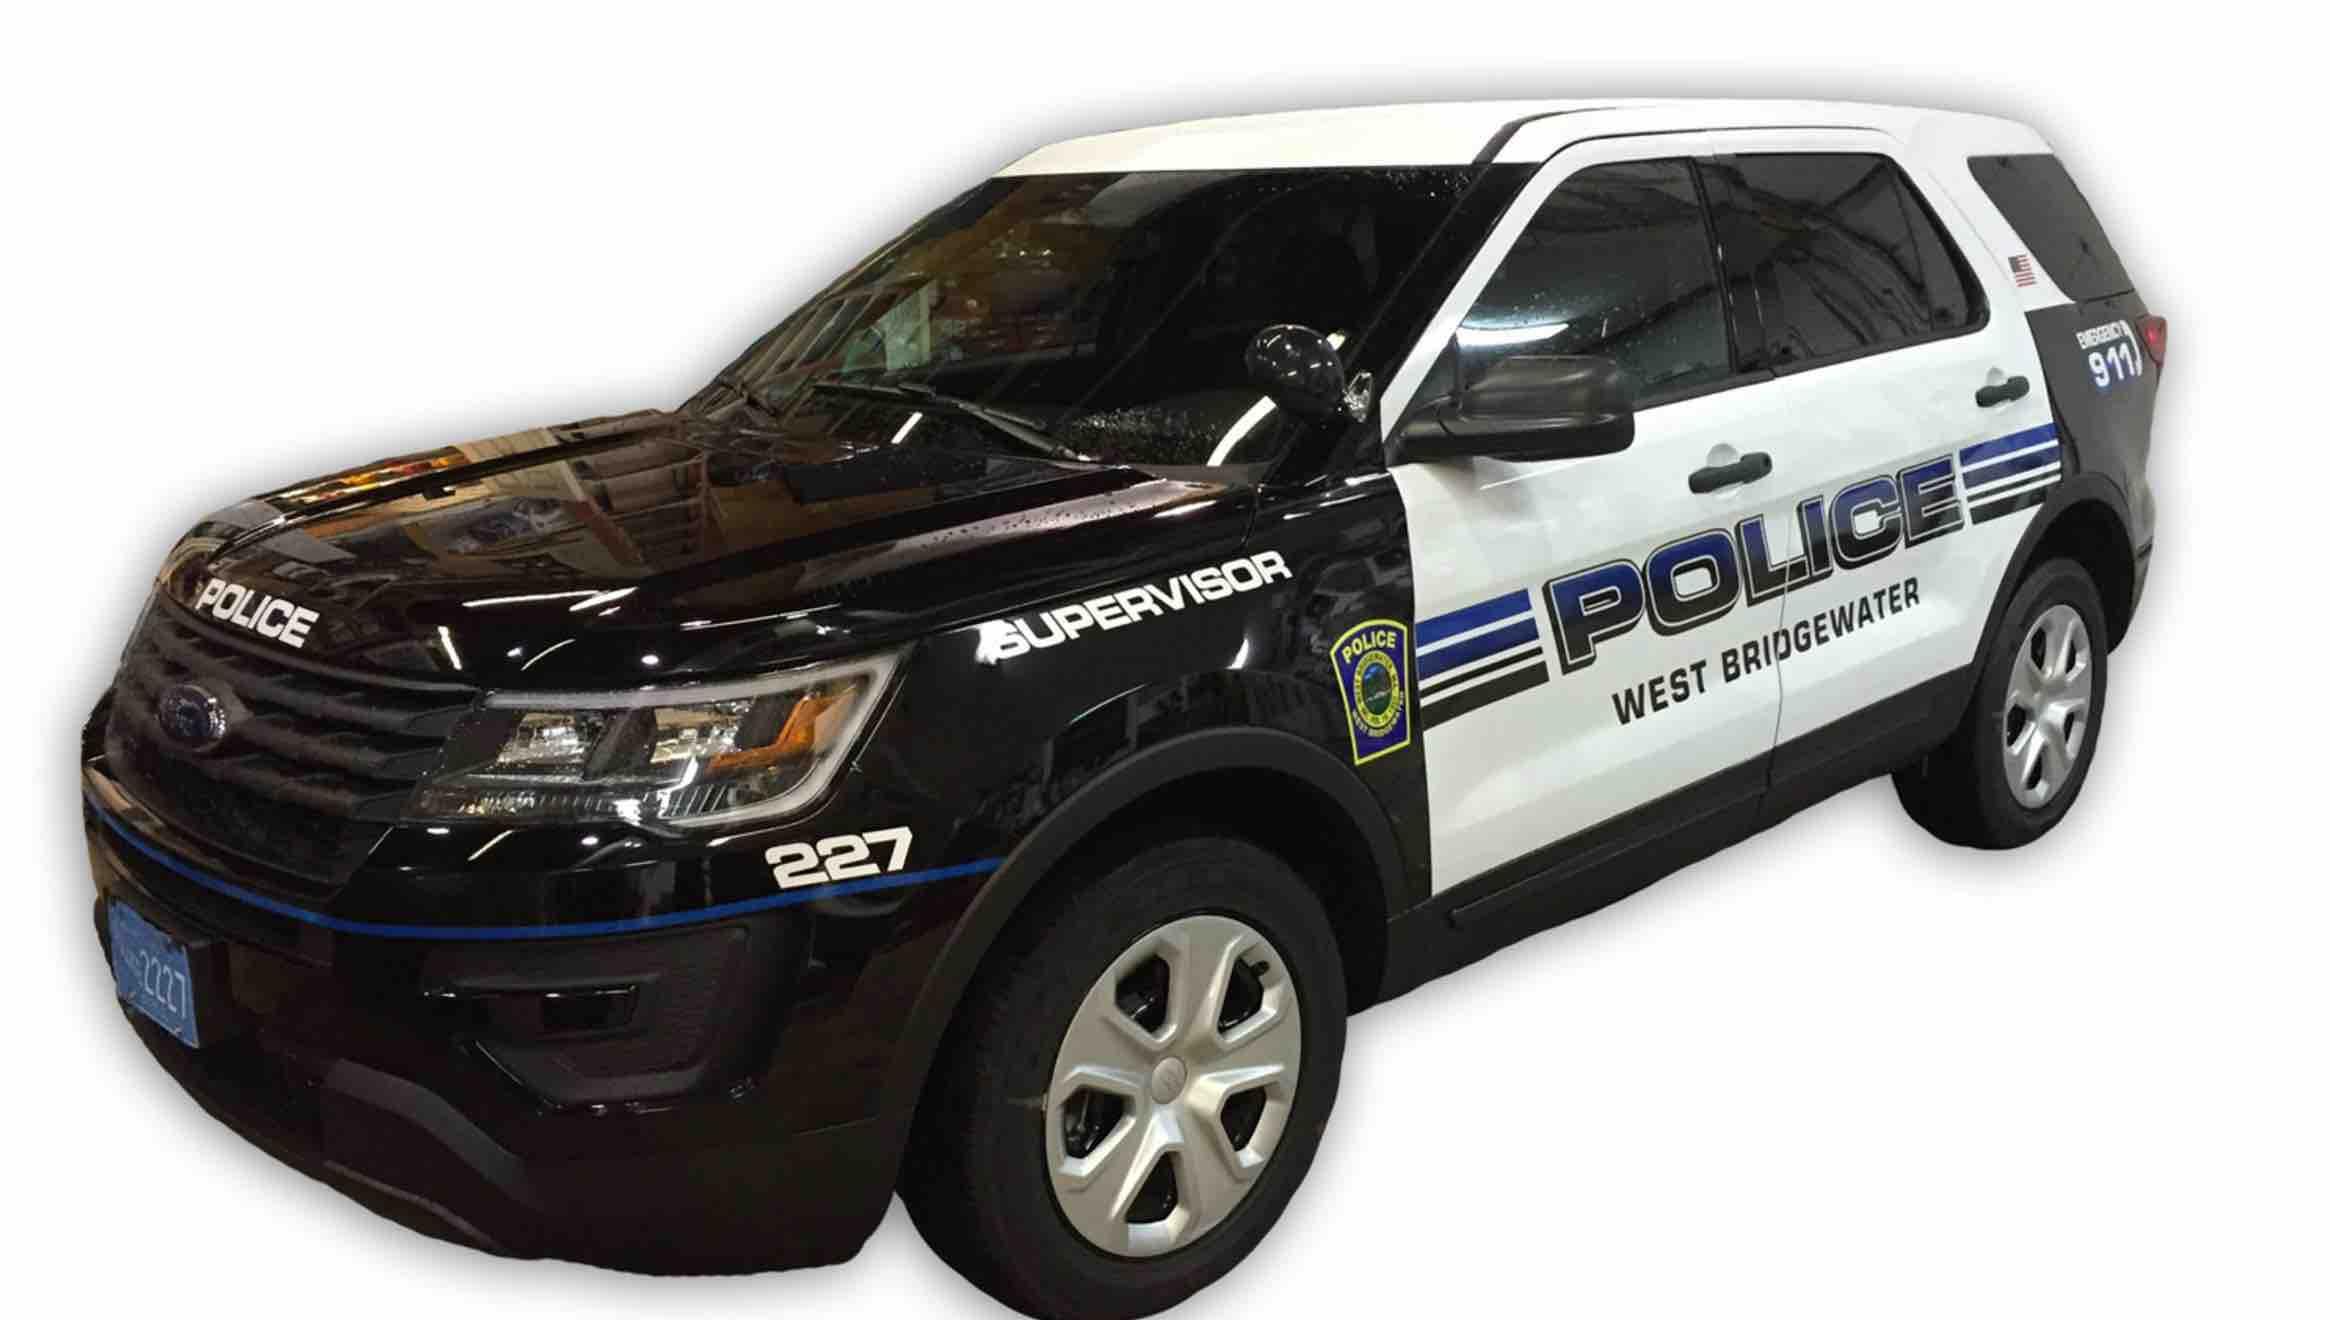 police-suv-graphics5.jpeg